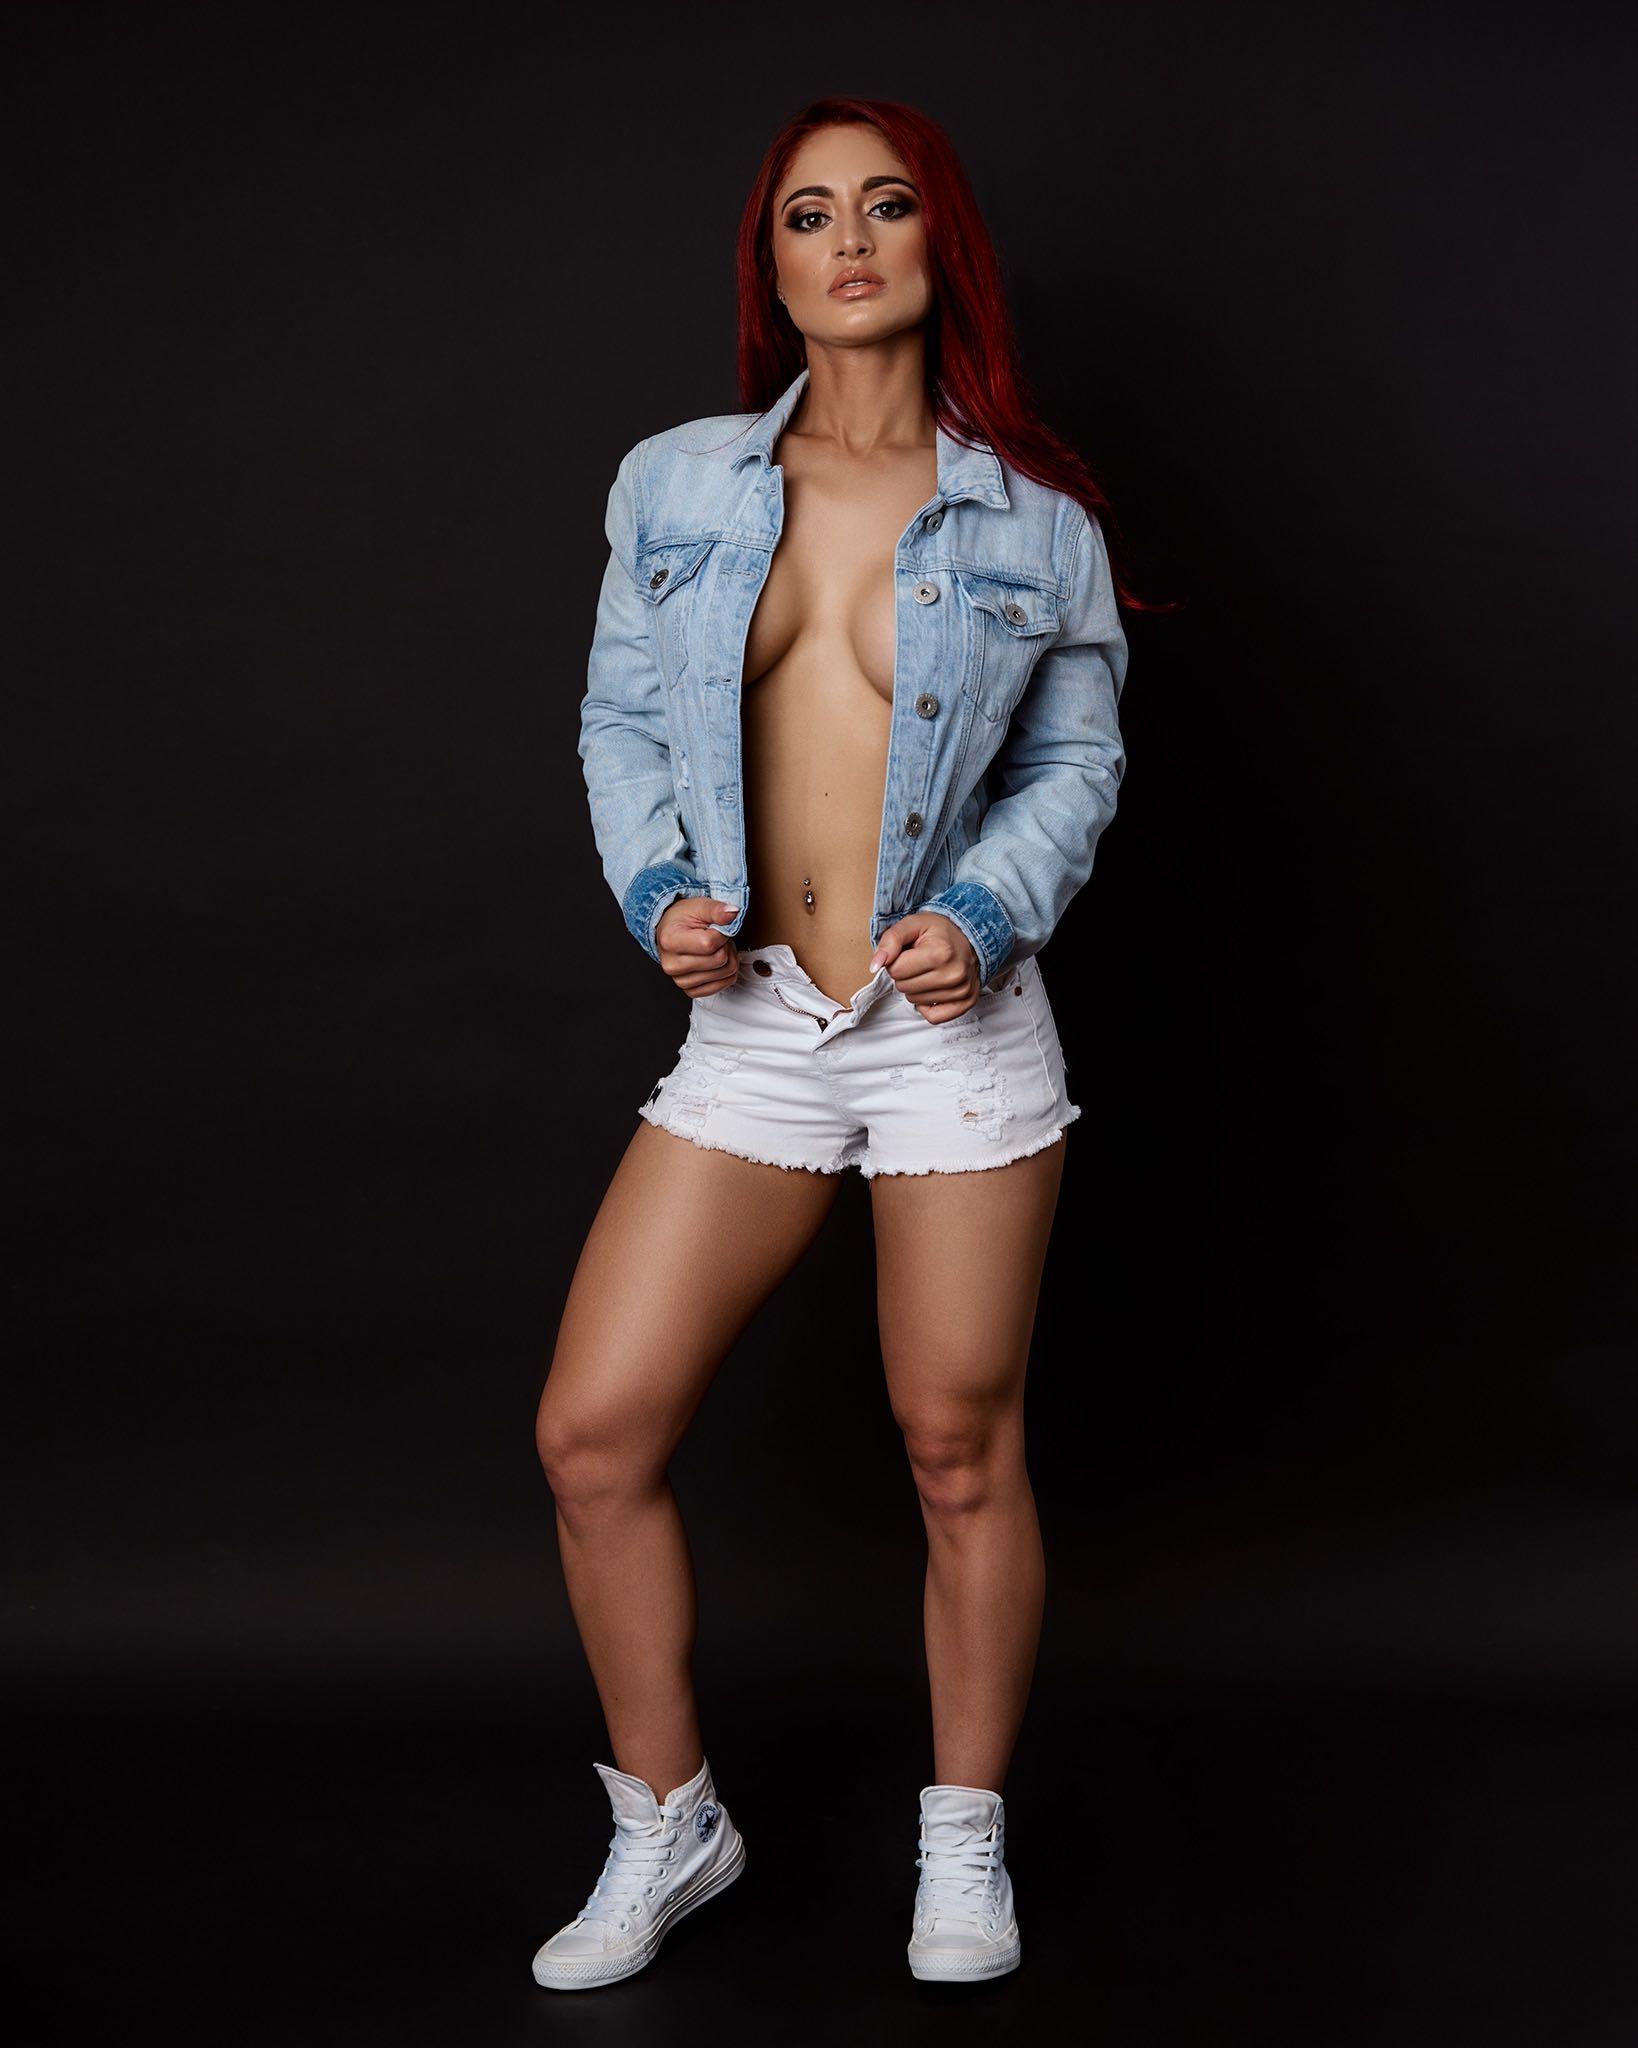 Meet Kayla De Lange in our SA Girls feature